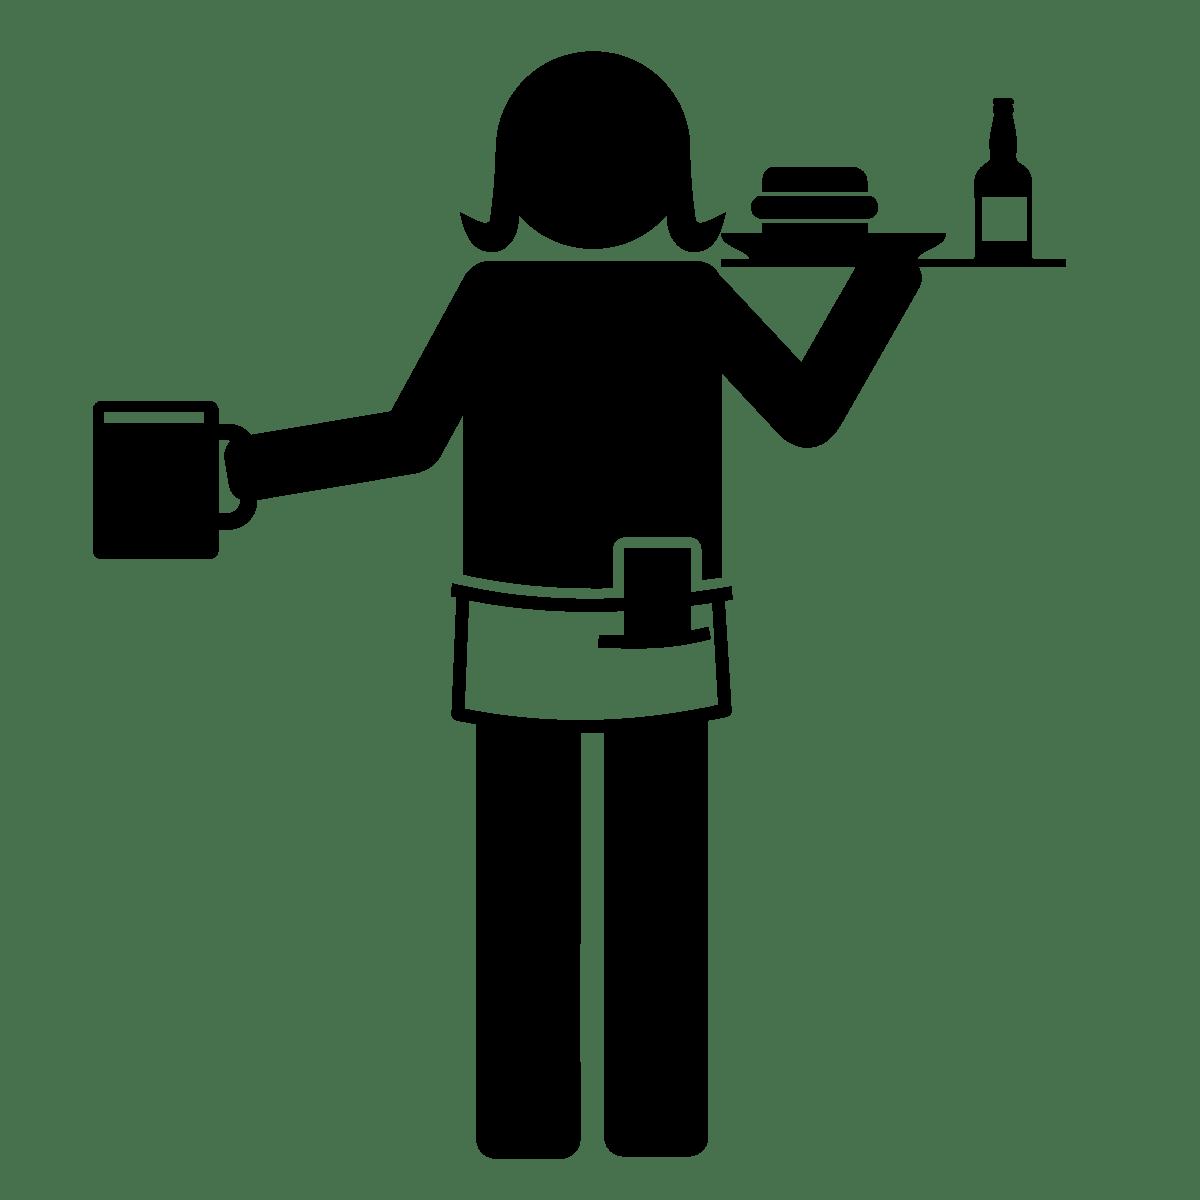 of austin restaurants. Clipart restaurant restaurant worker